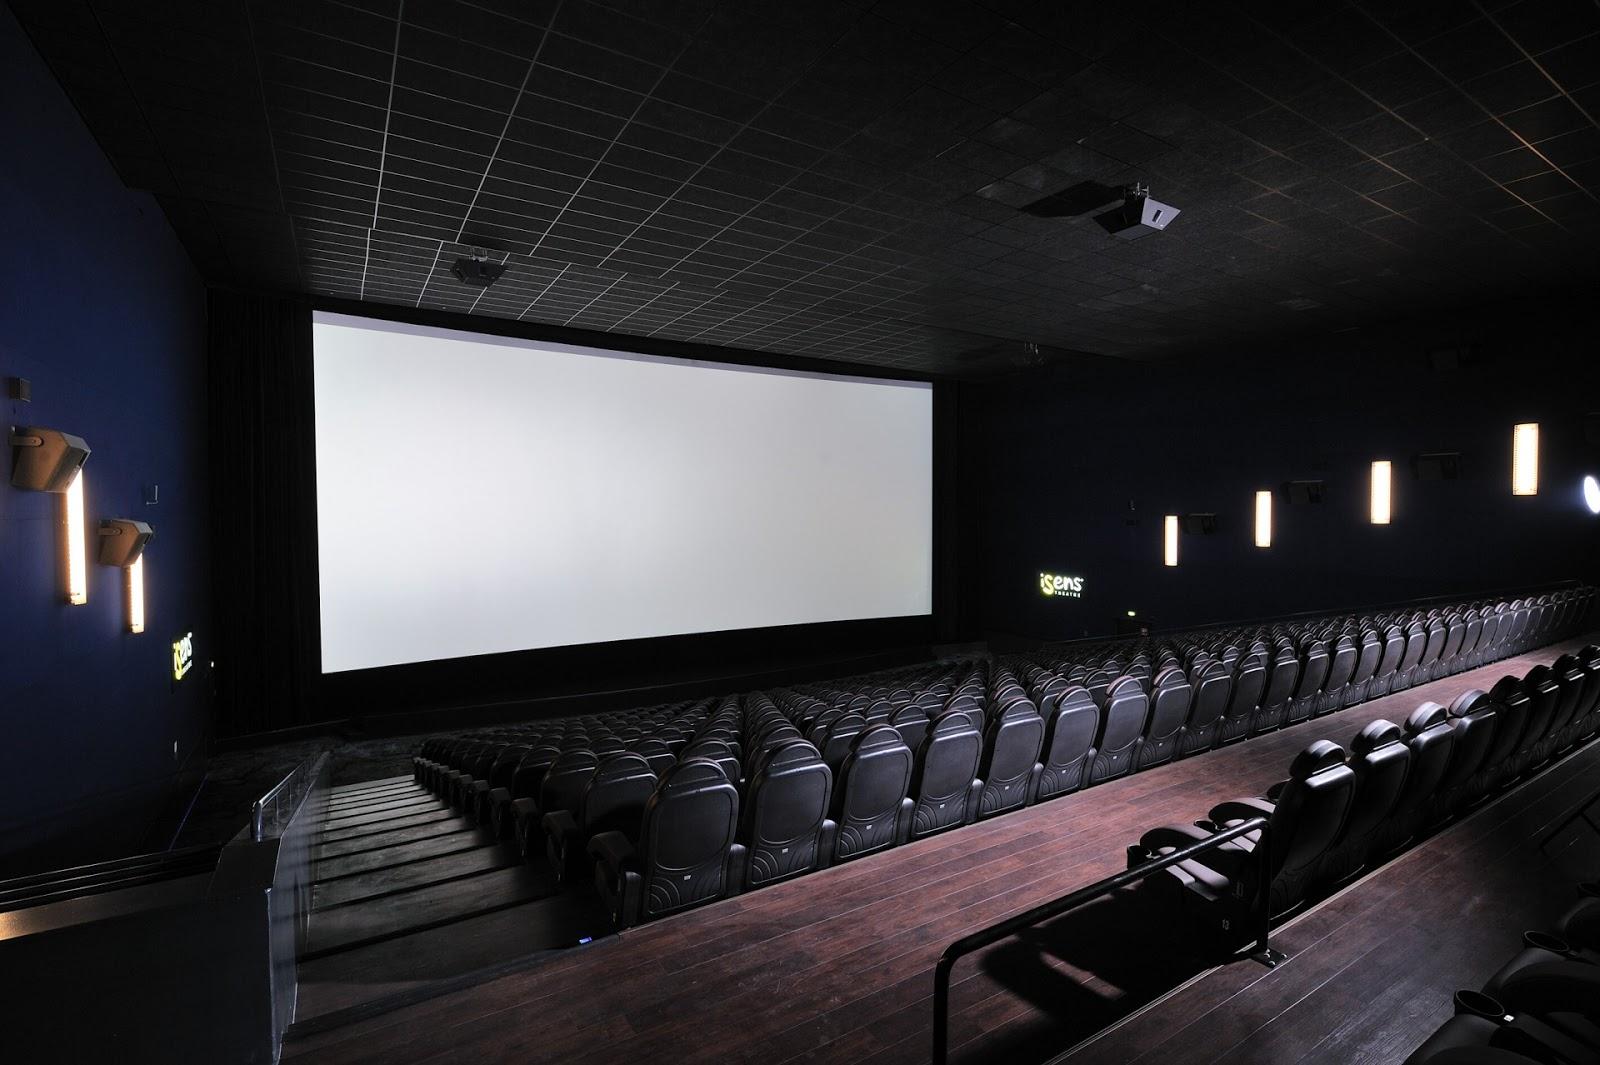 Kinoplex Whv